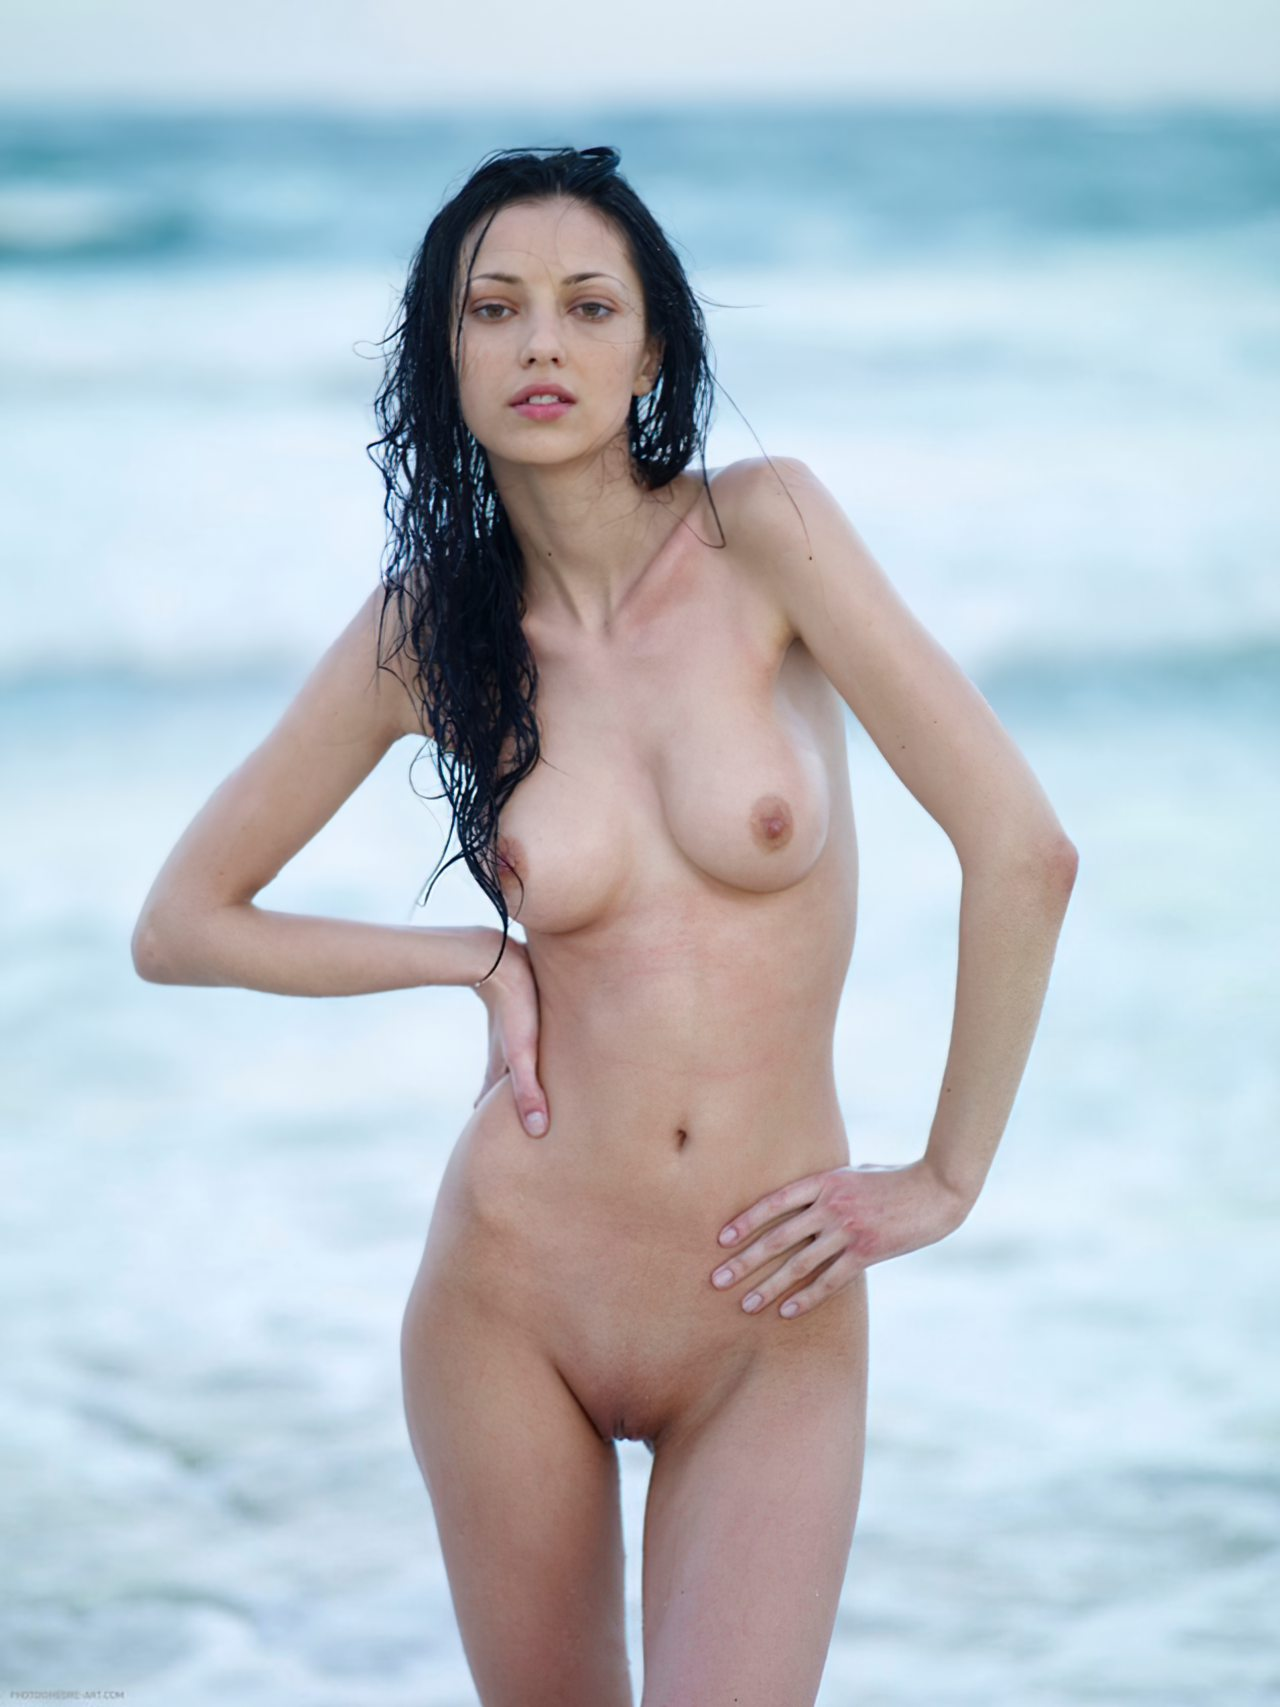 Mulheres Despidas (42)